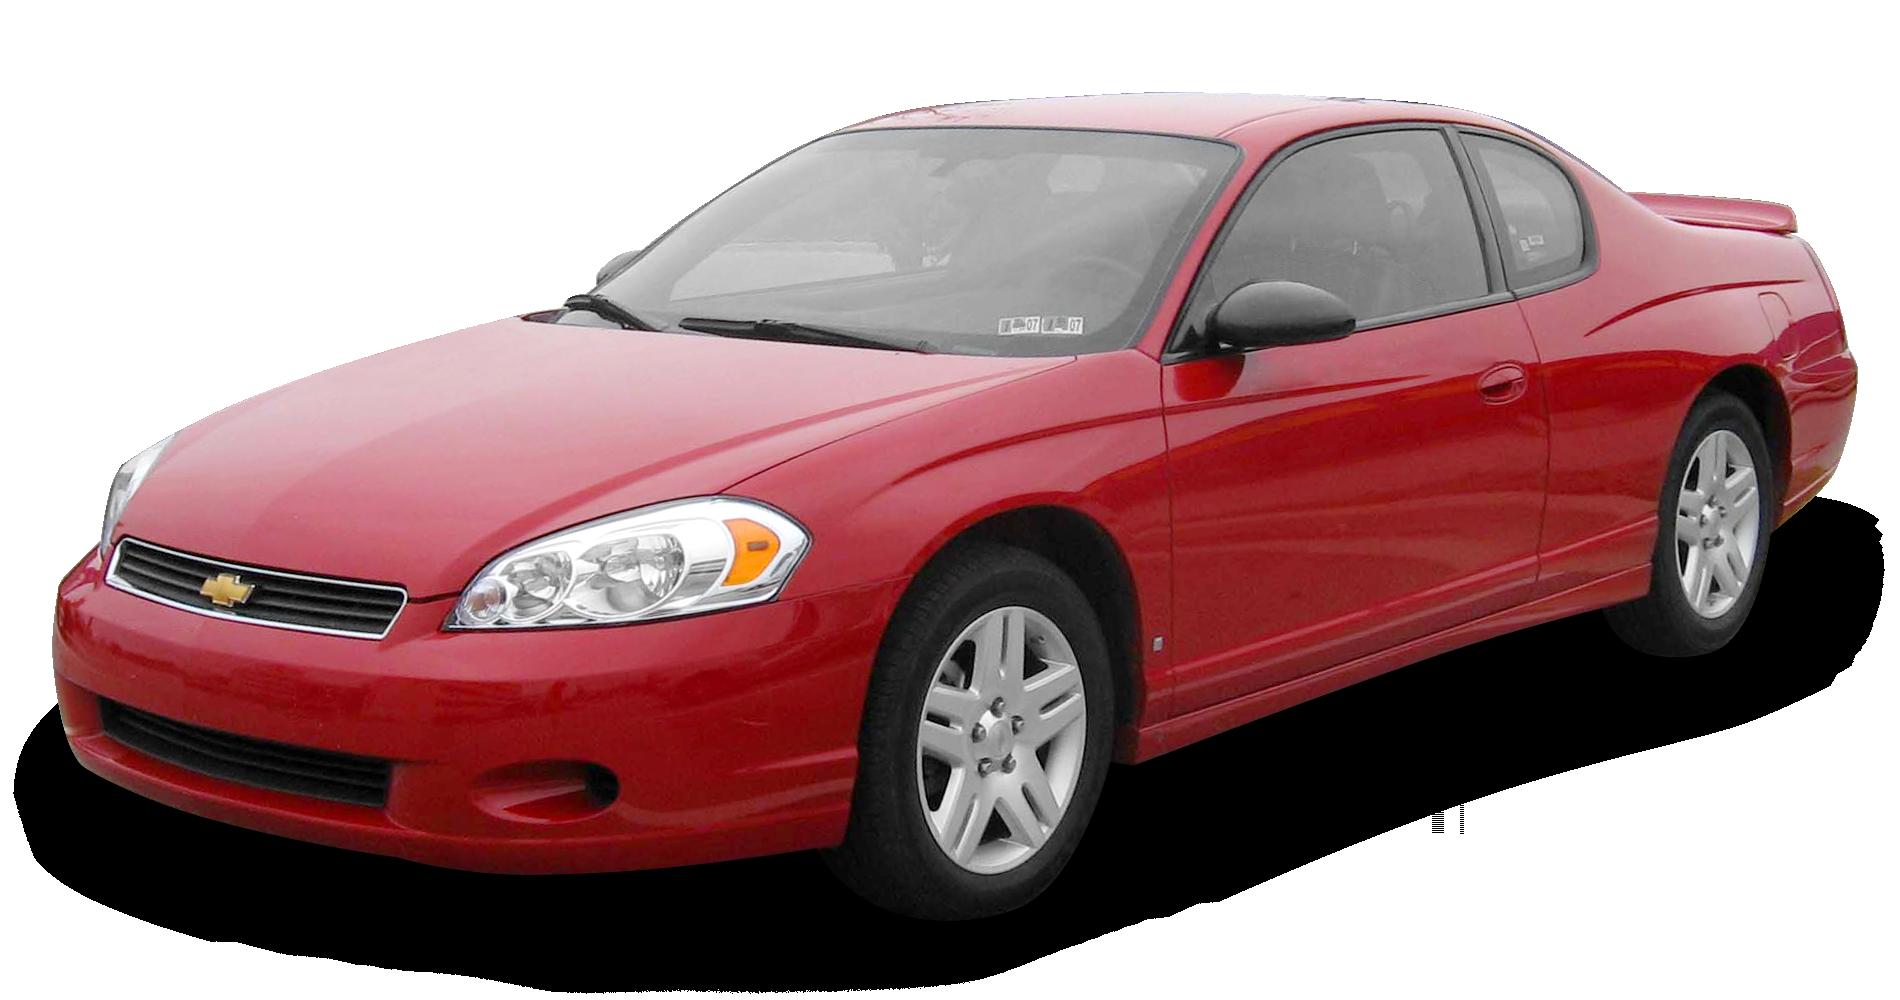 Chevy Monte Carlo Parts | Genuine GM Car Parts At Wholesale | GM Car Parts